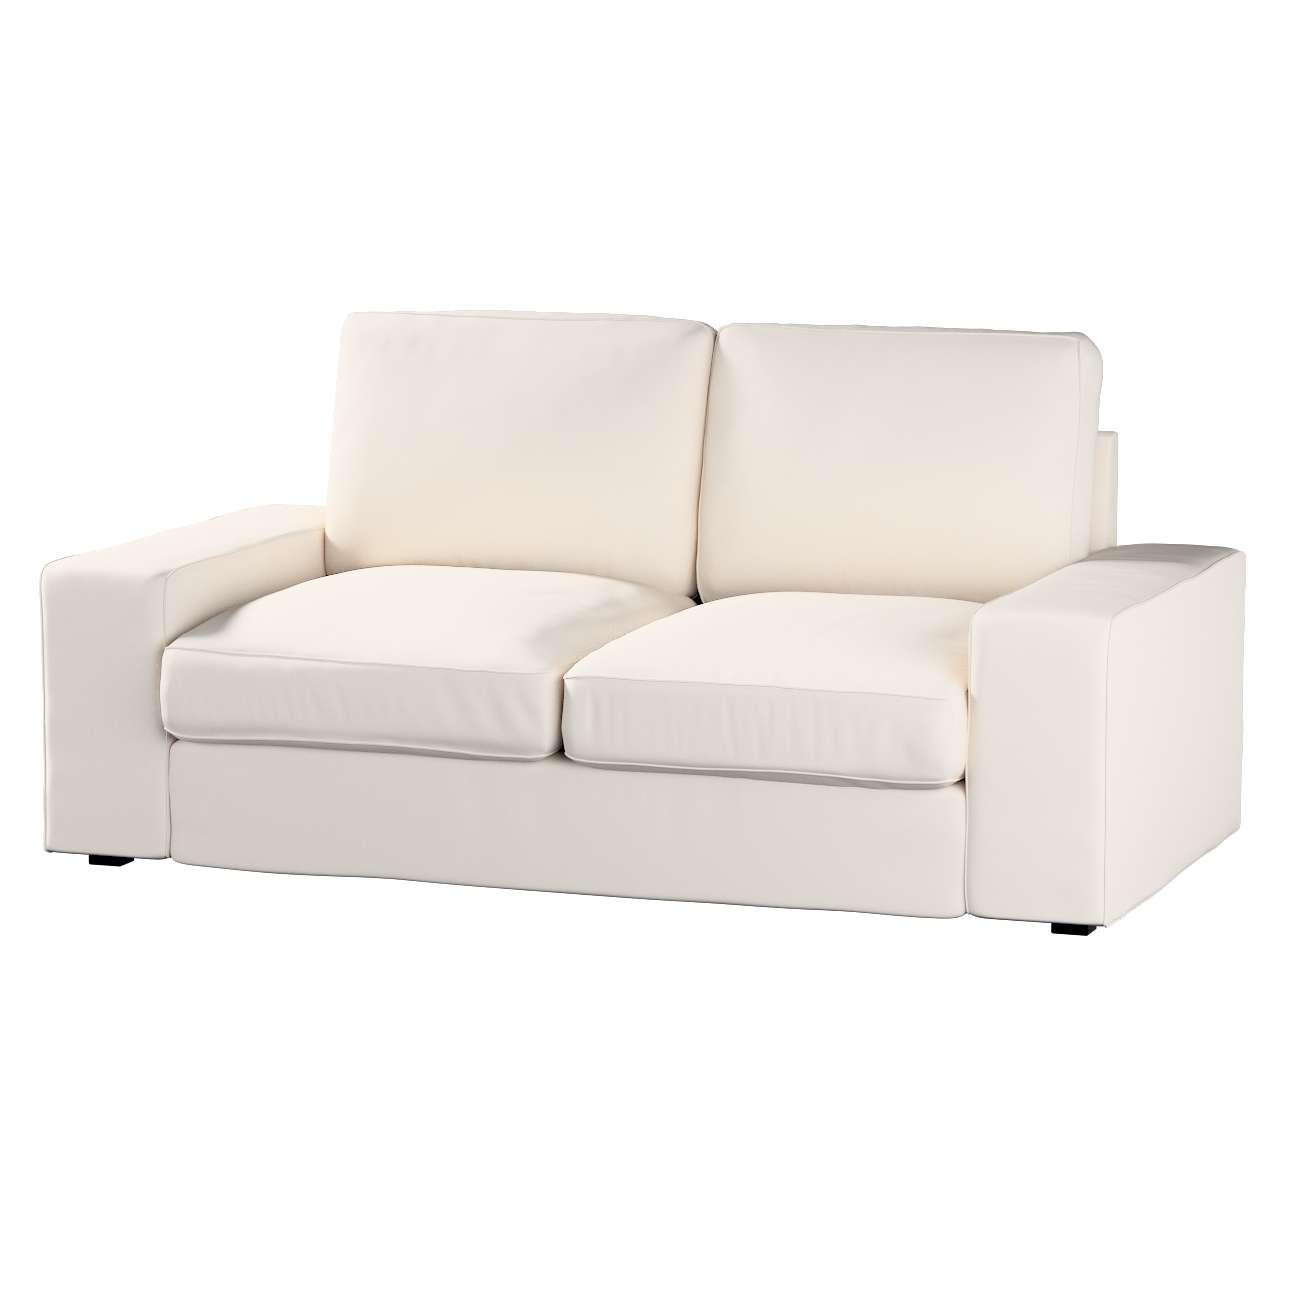 Kivik 2-Sitzer Sofabezug Sofa Kivik 2-Sitzer von der Kollektion Etna, Stoff: 705-01